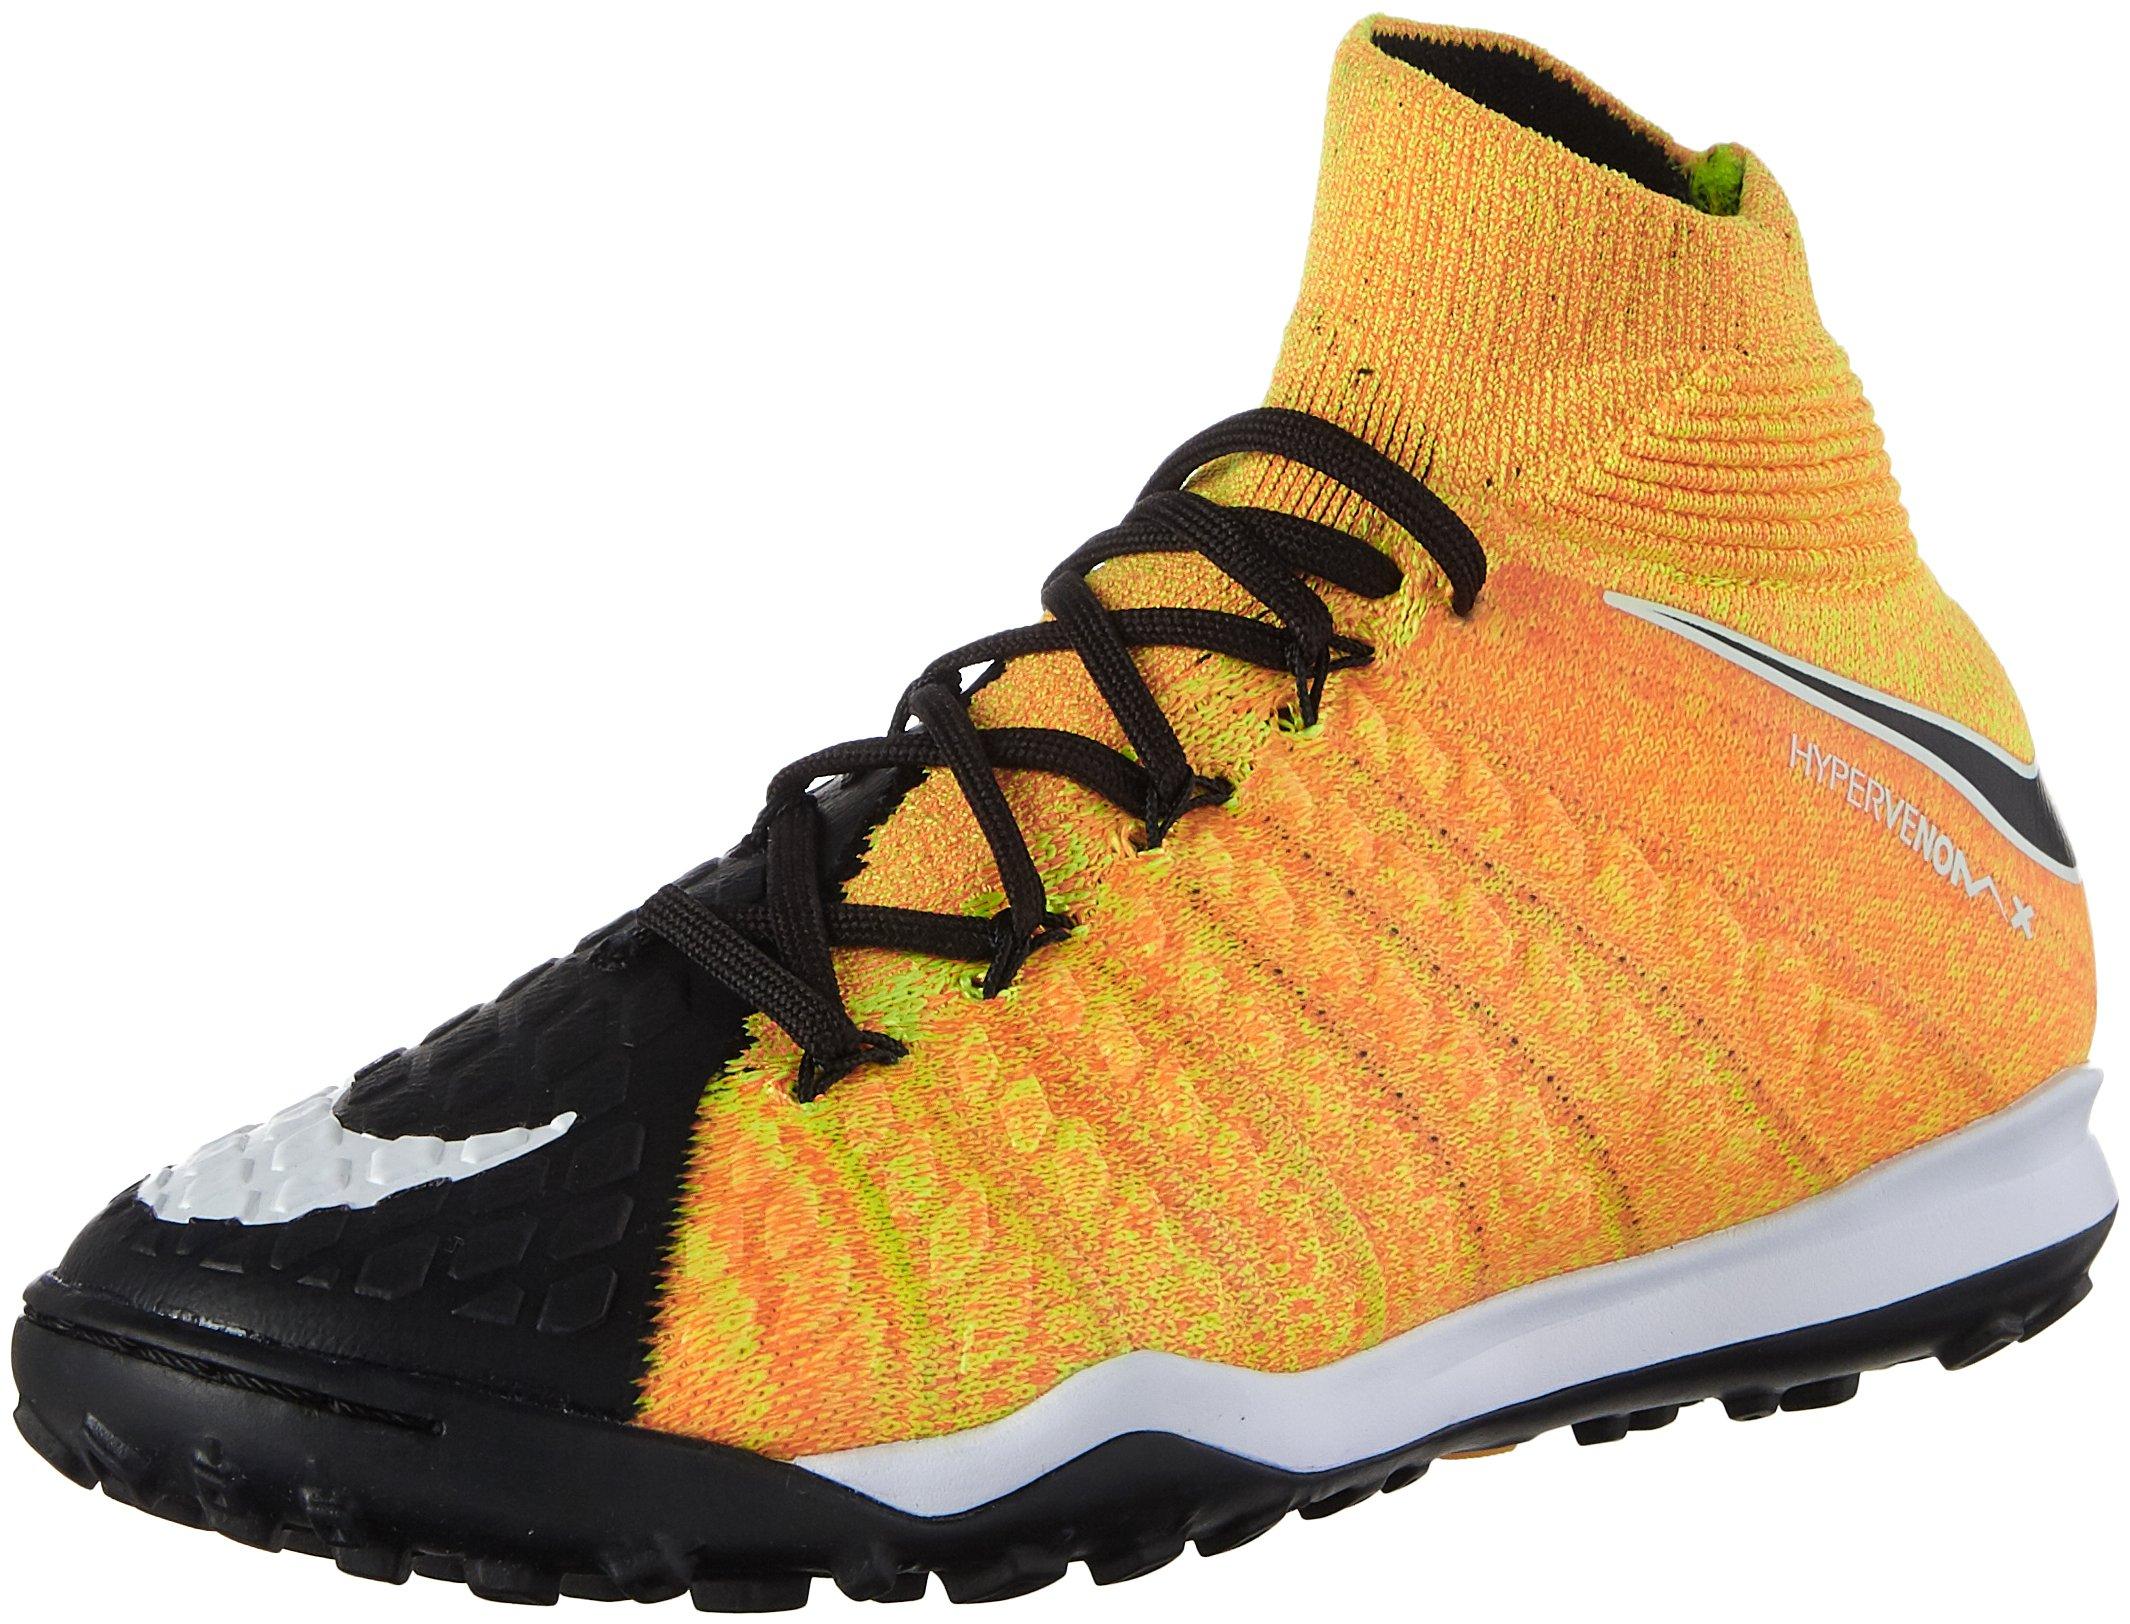 Nike Junior Hypervenomx Proximo II DF TF Soccer Shoes (Laser Orange/Black) (5 Big Kid M)